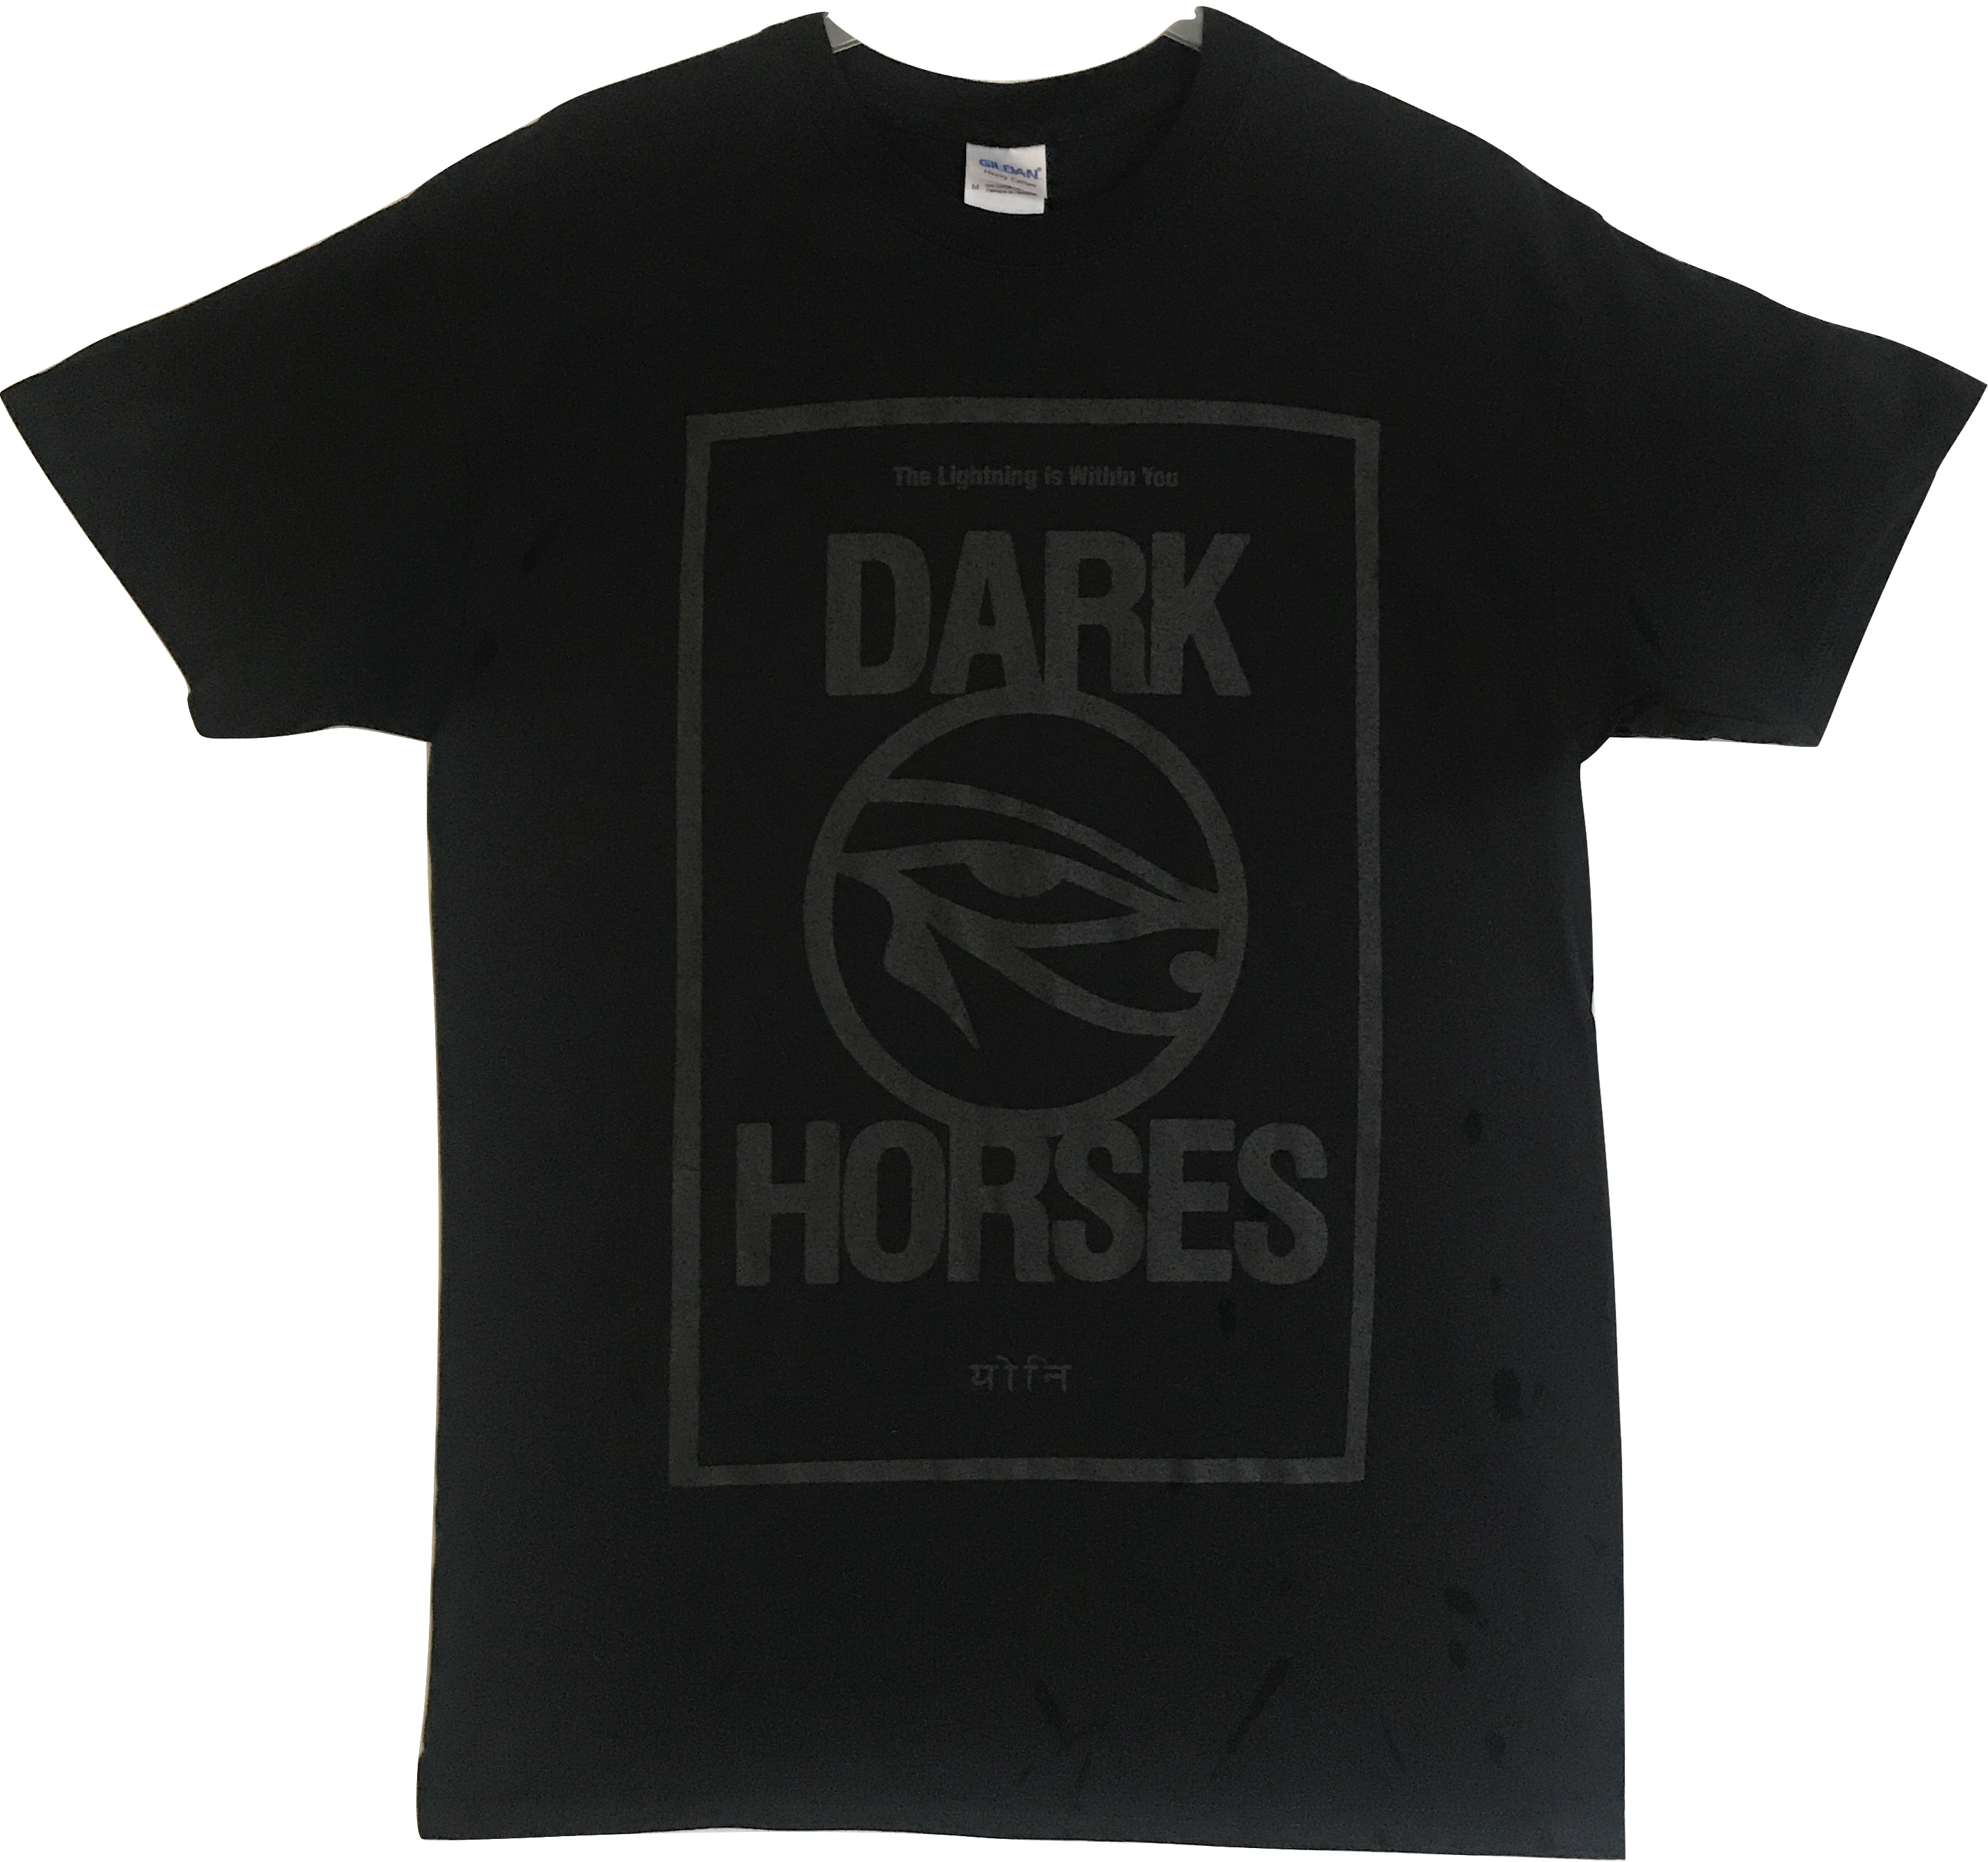 Dark Horses T-shirt - black on black - Dark Horses